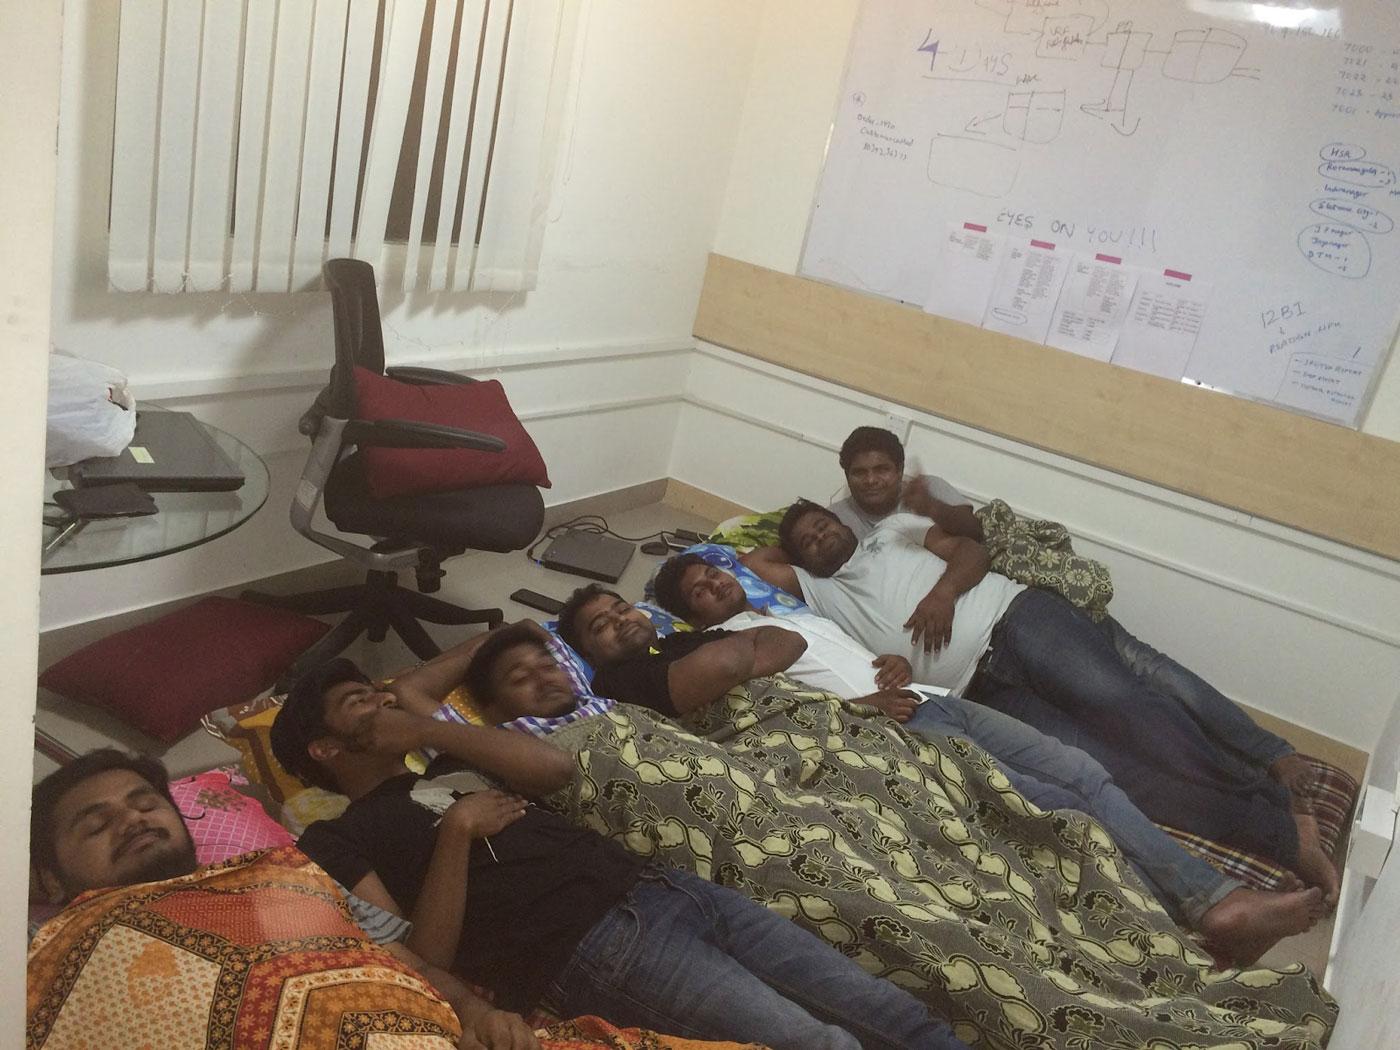 Meet The Ninjacart Team   Early Days of Ninjacart Team - Founders sleeping in the office